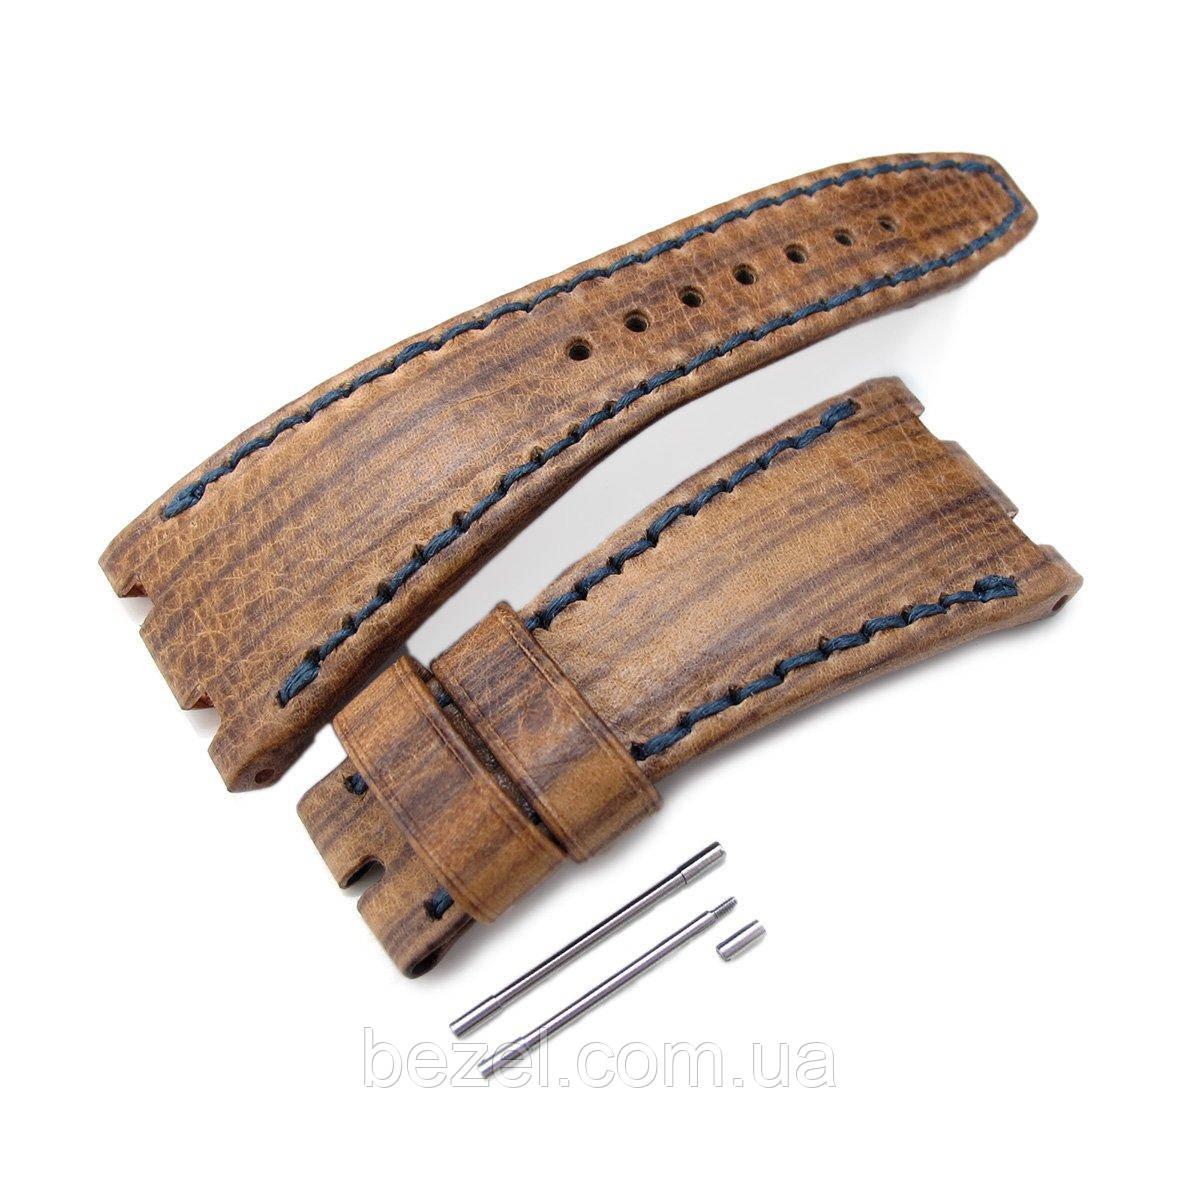 Brown Oak Wood Leather of Art Watch Strap, Wax thread Dark Navy Stitching, custom made for Audemars Piguet Royal Oak Offshore